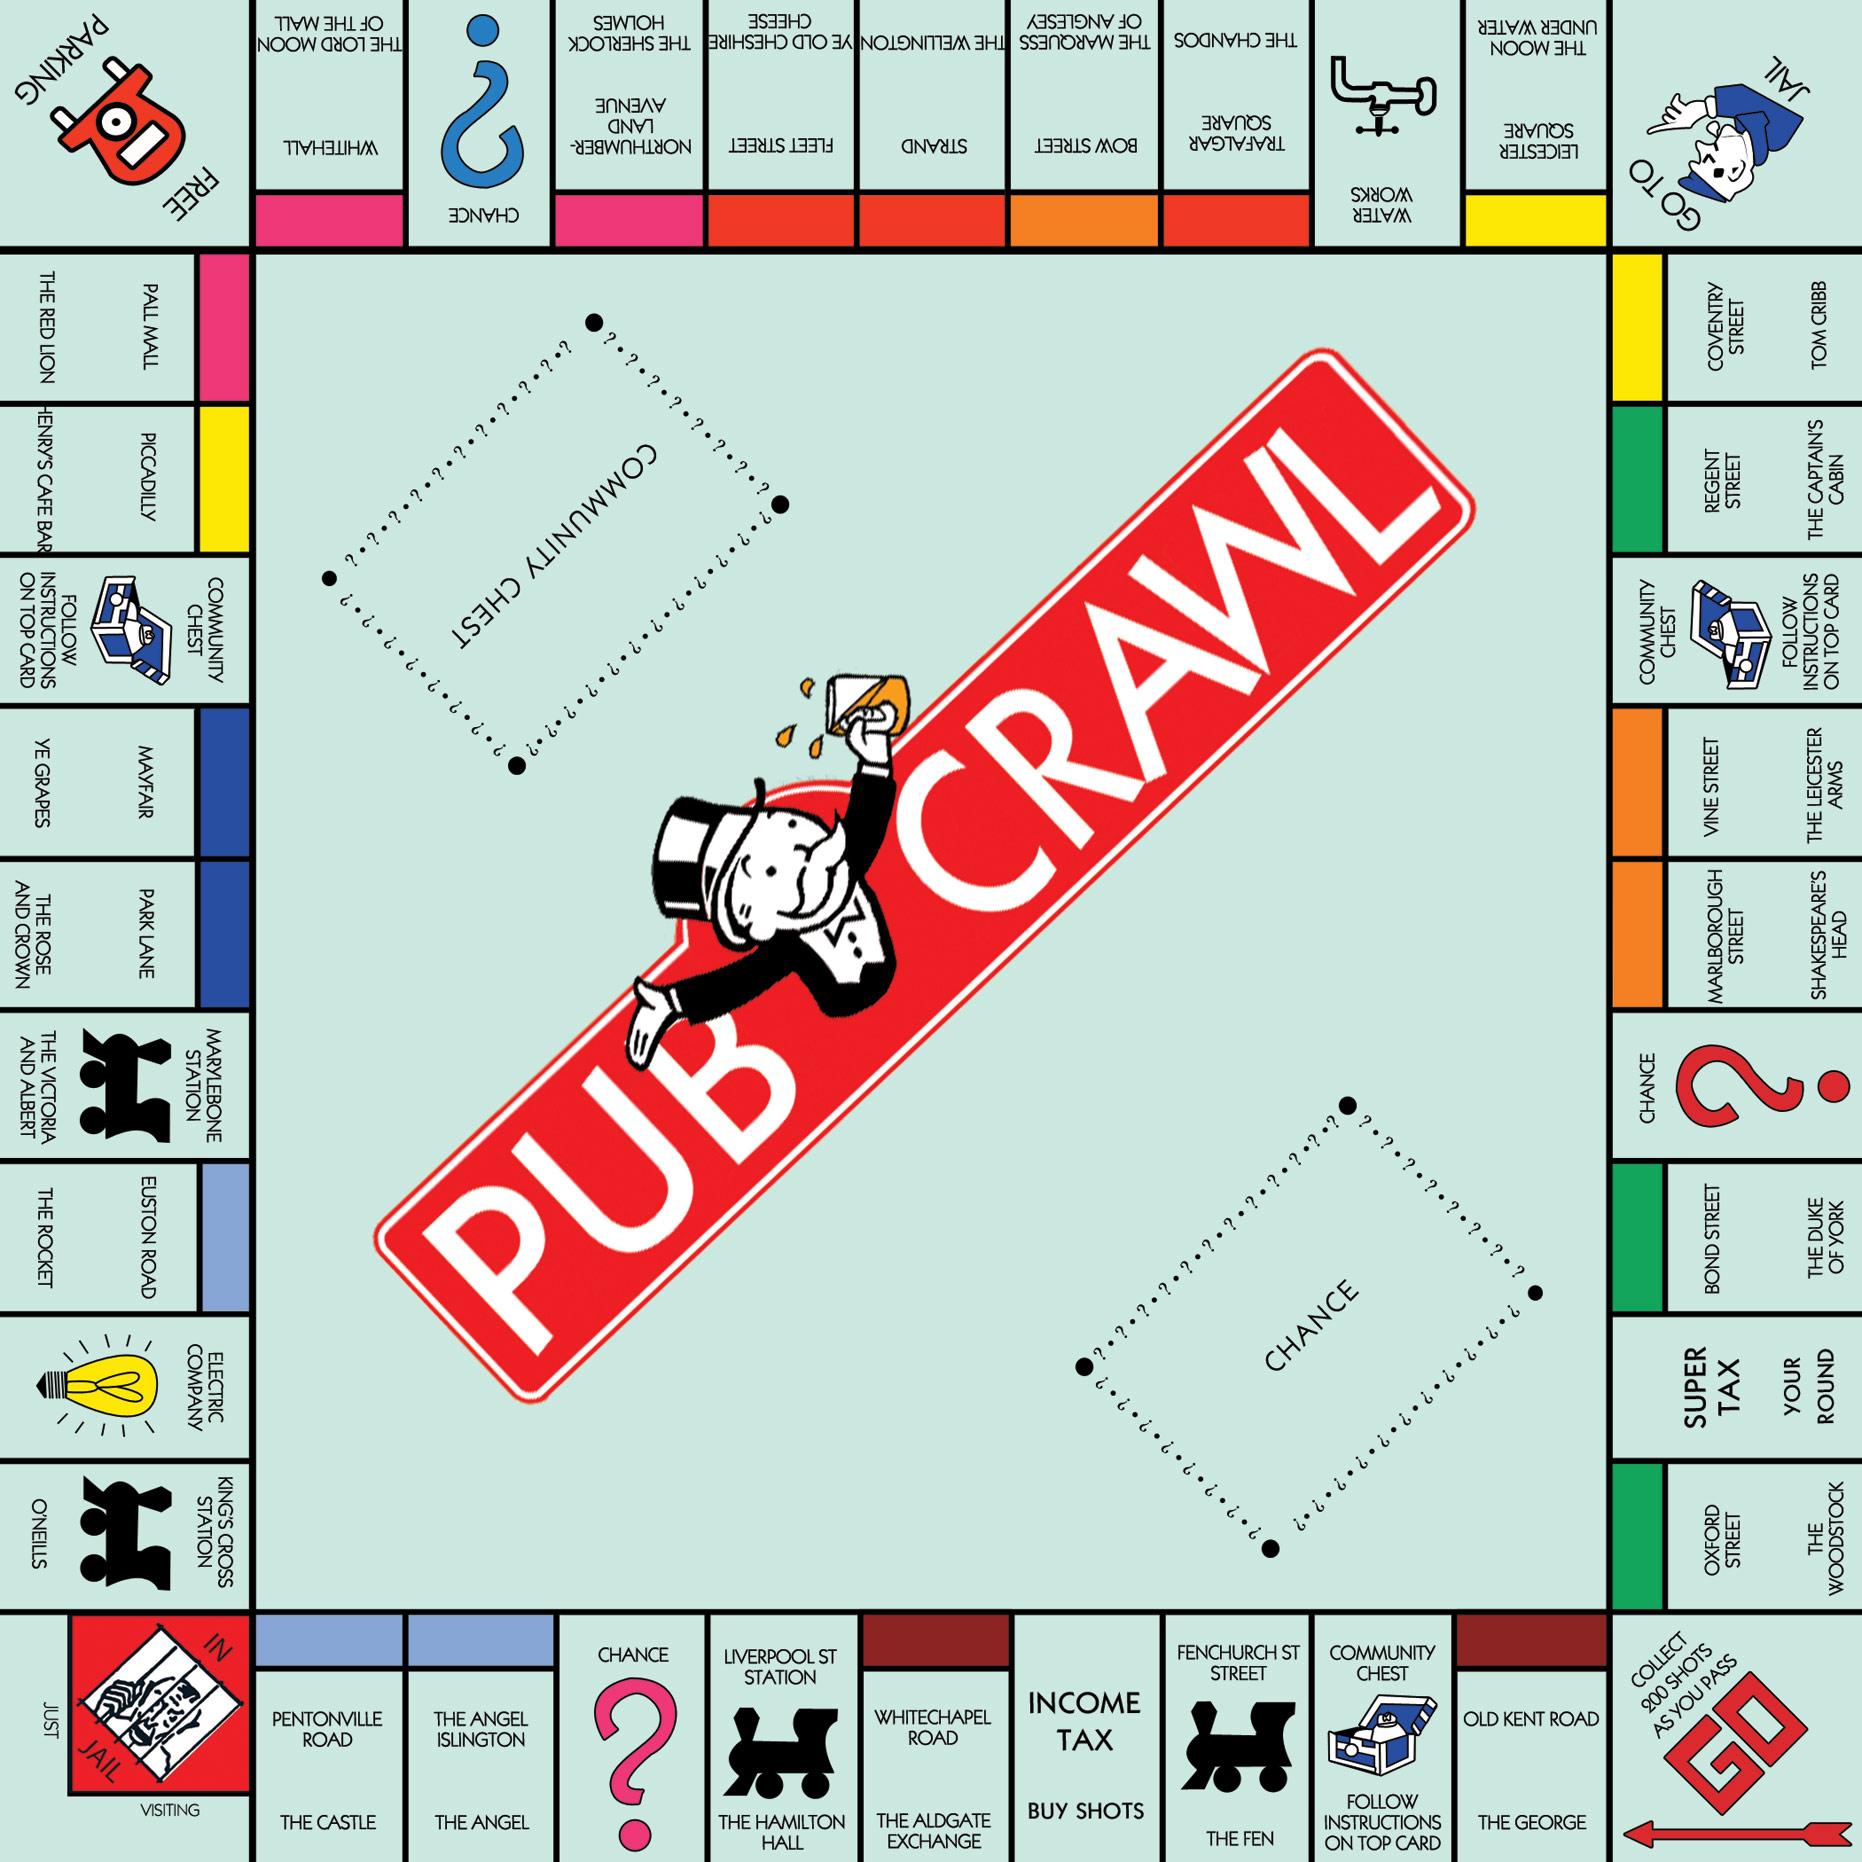 MONOPOLYBOARDPUBCRAW Monopoly Board - 1862x1862 - jpeg